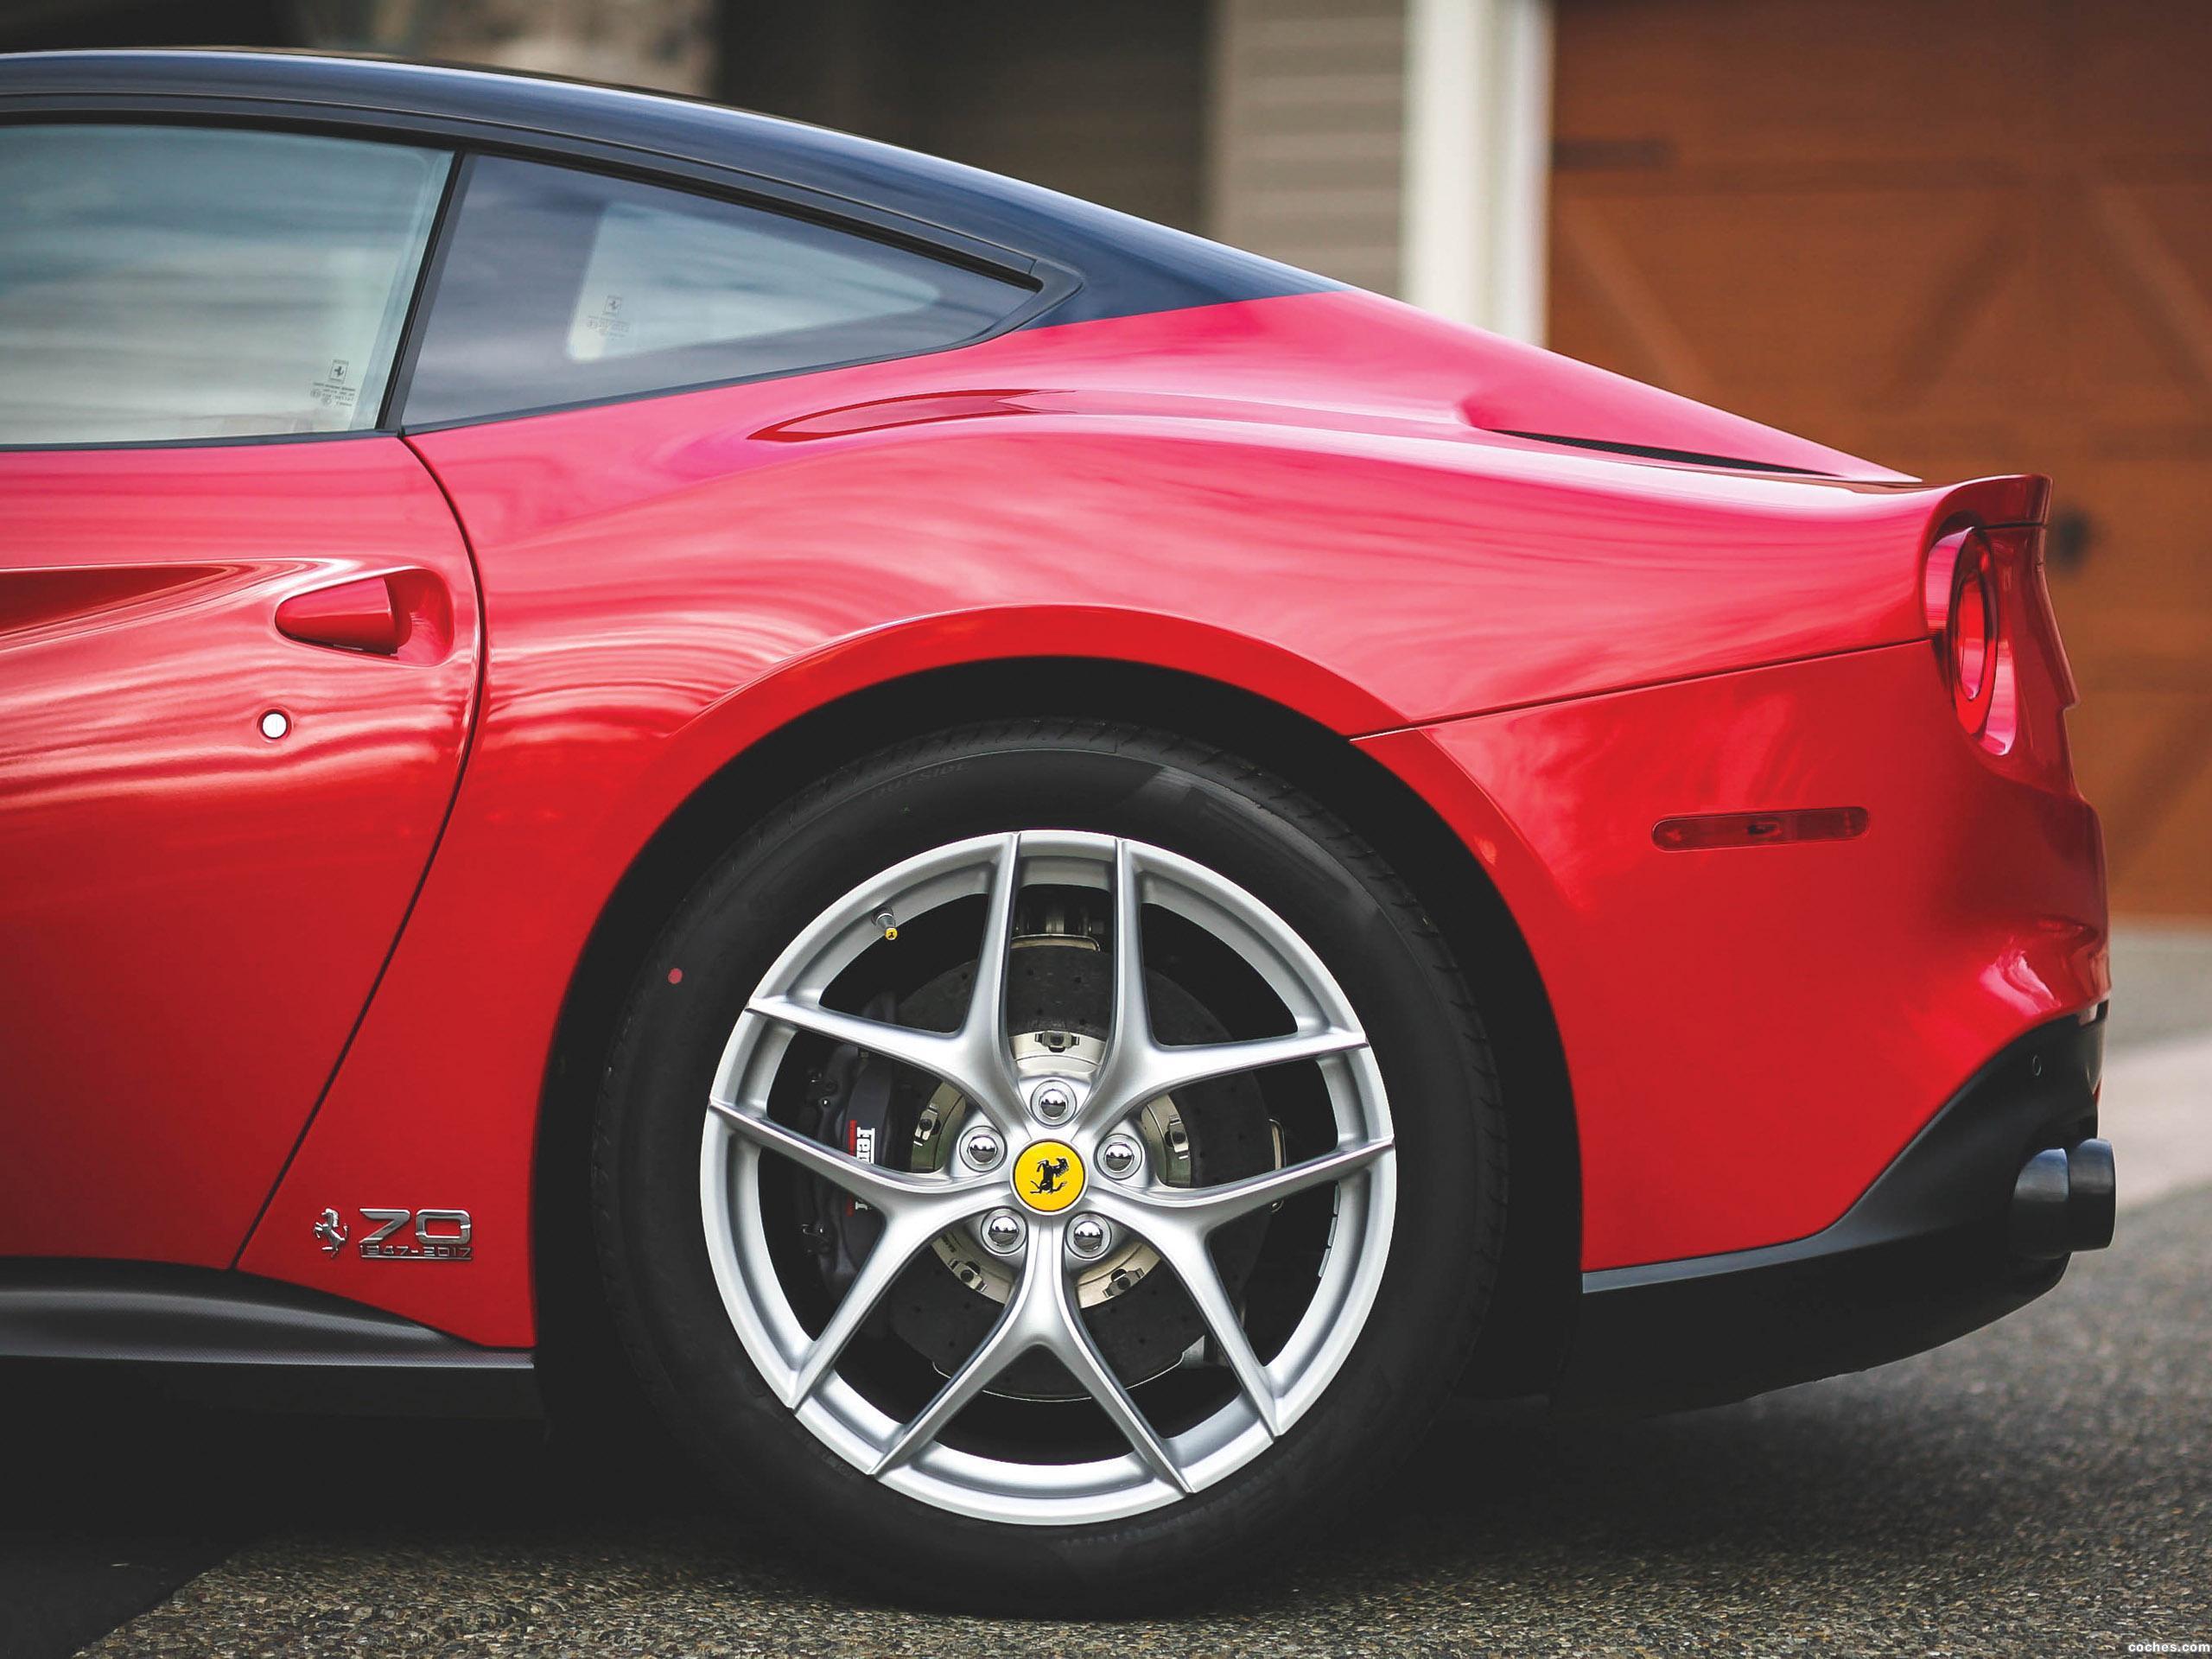 Foto 16 de Ferrari F12 berlinetta The Magnum Pi 2017